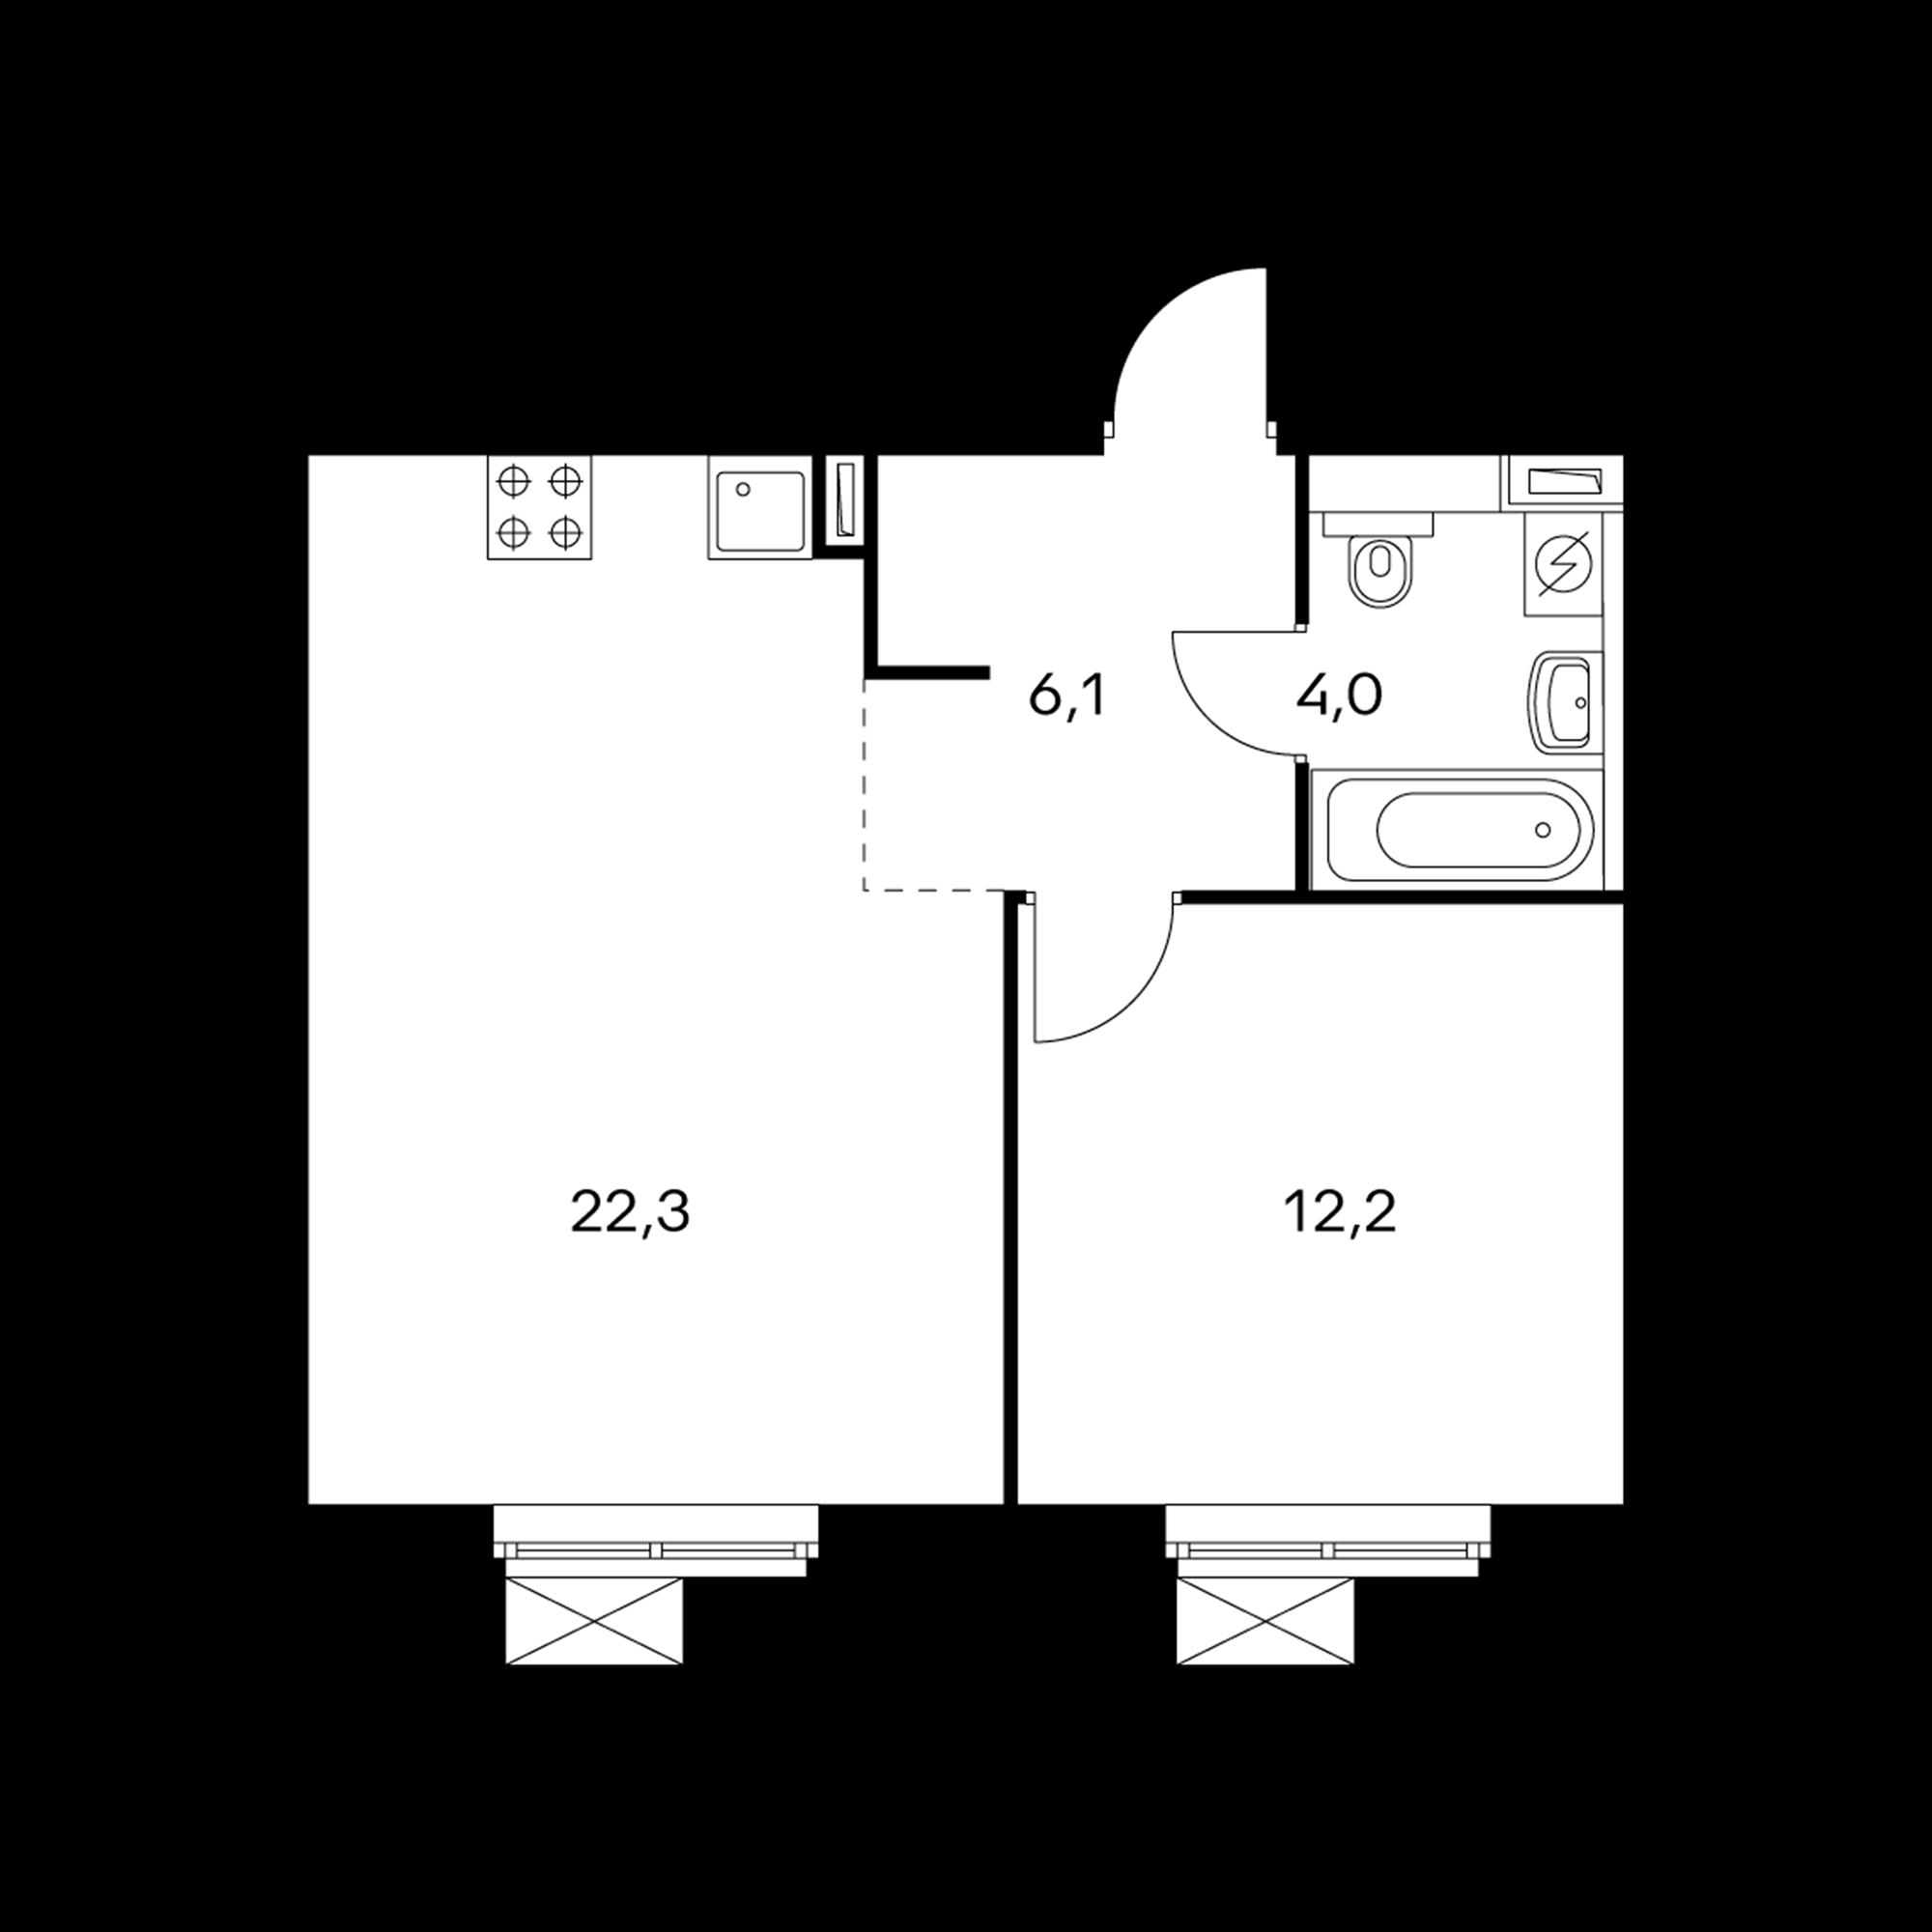 1EL5_7.8-1